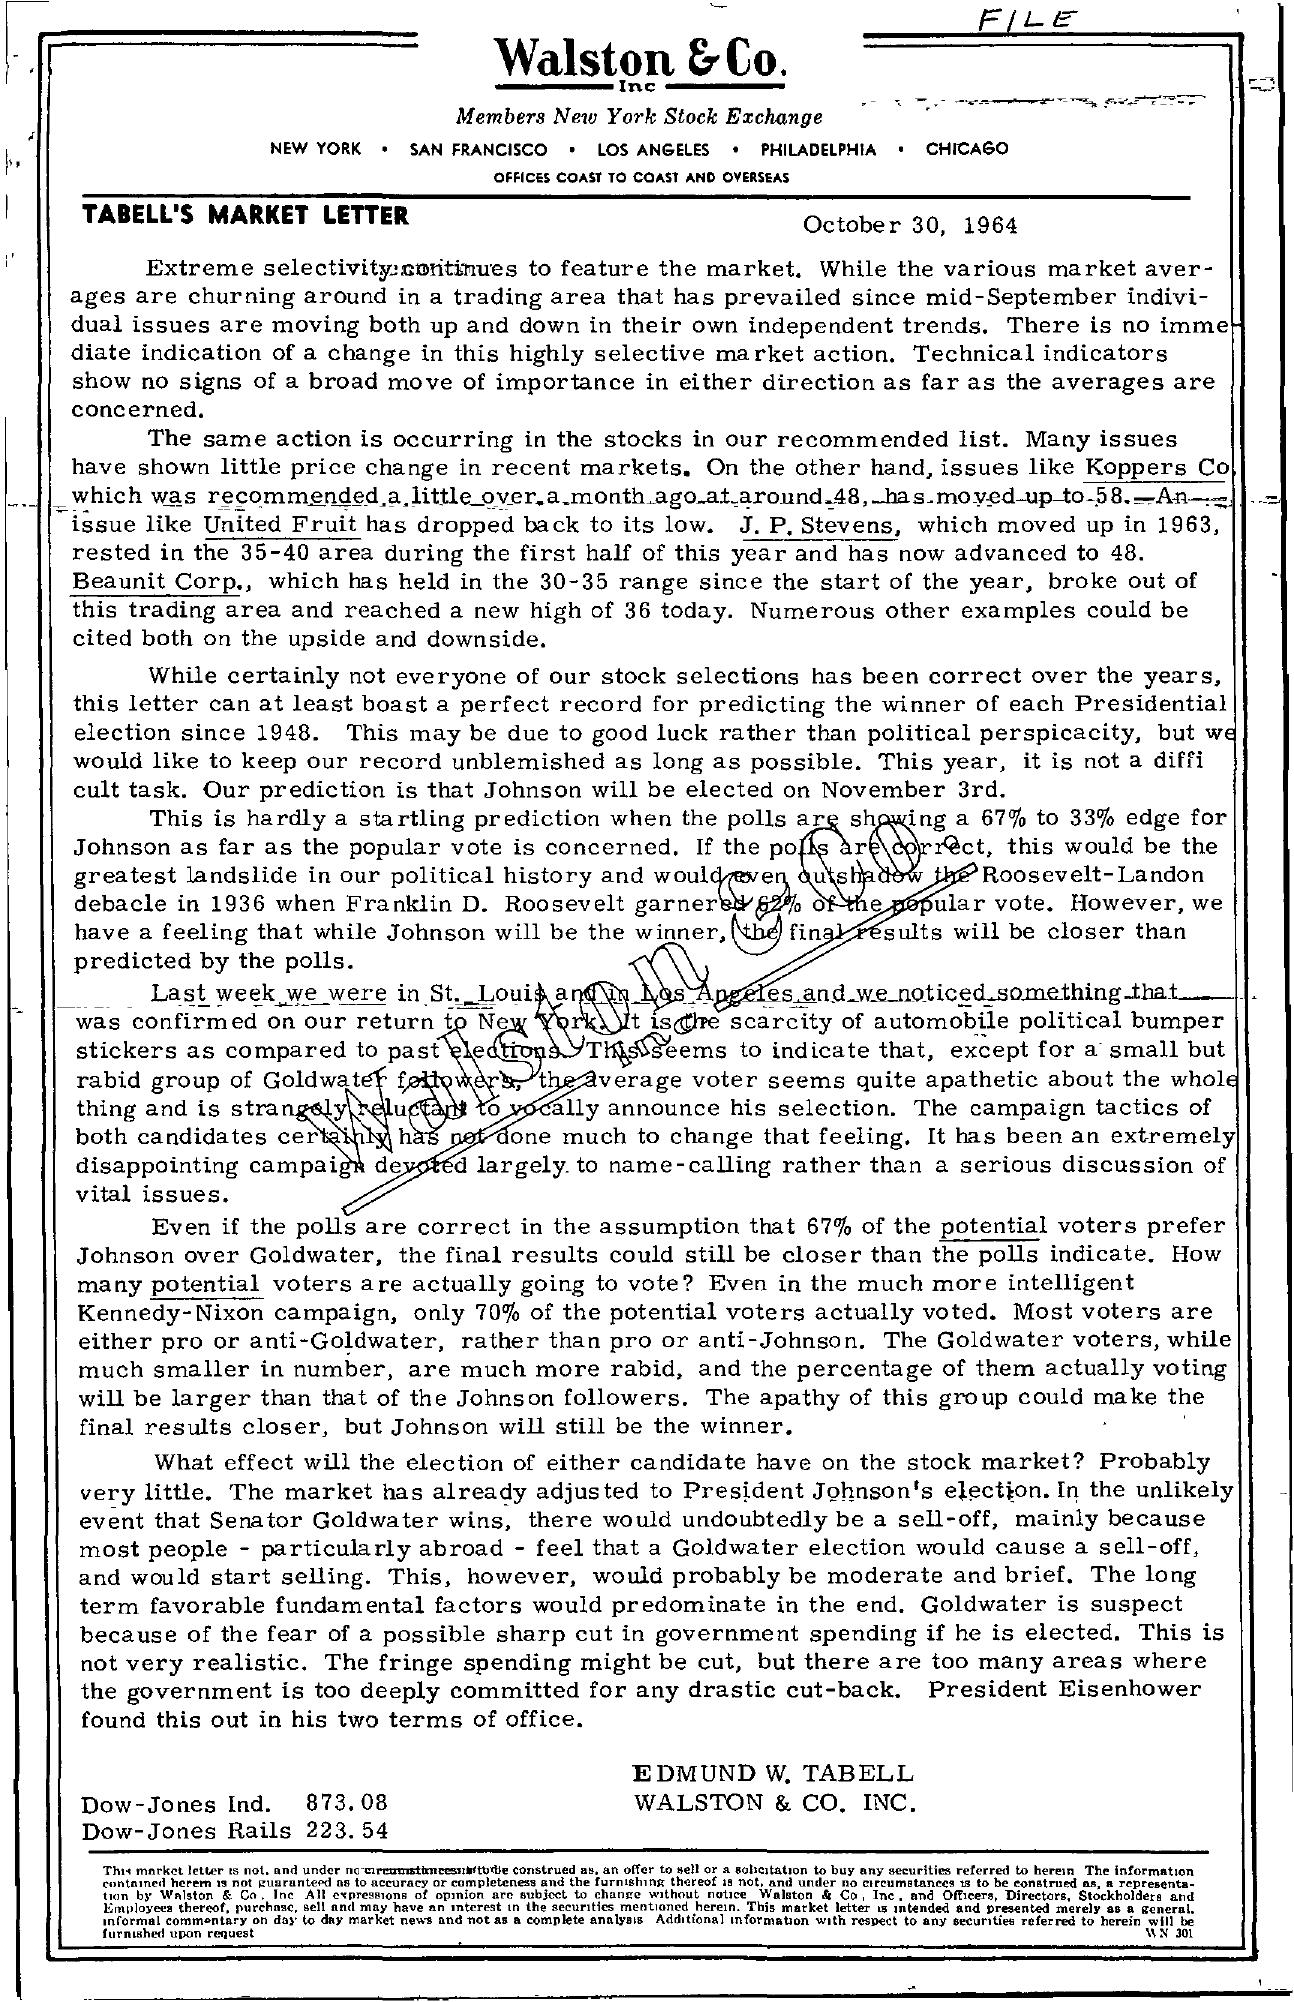 Tabell's Market Letter - October 30, 1964